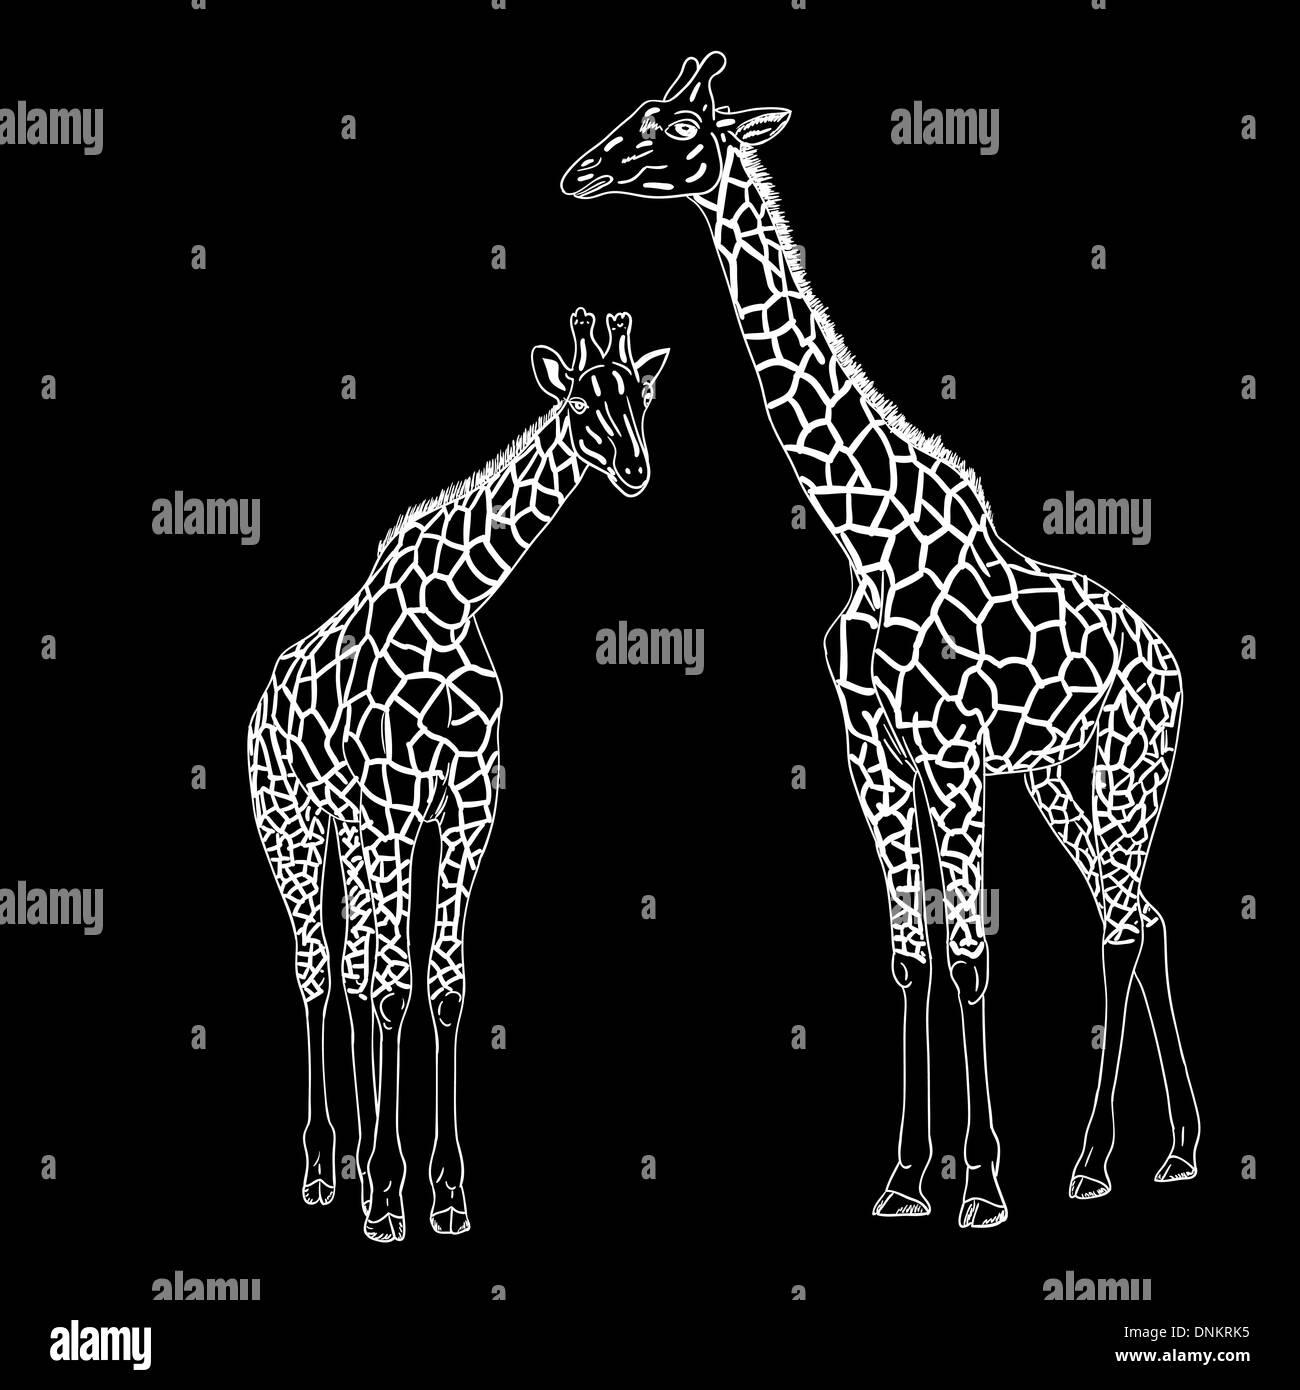 Two giraffes. Vector illustration. Stock Vector